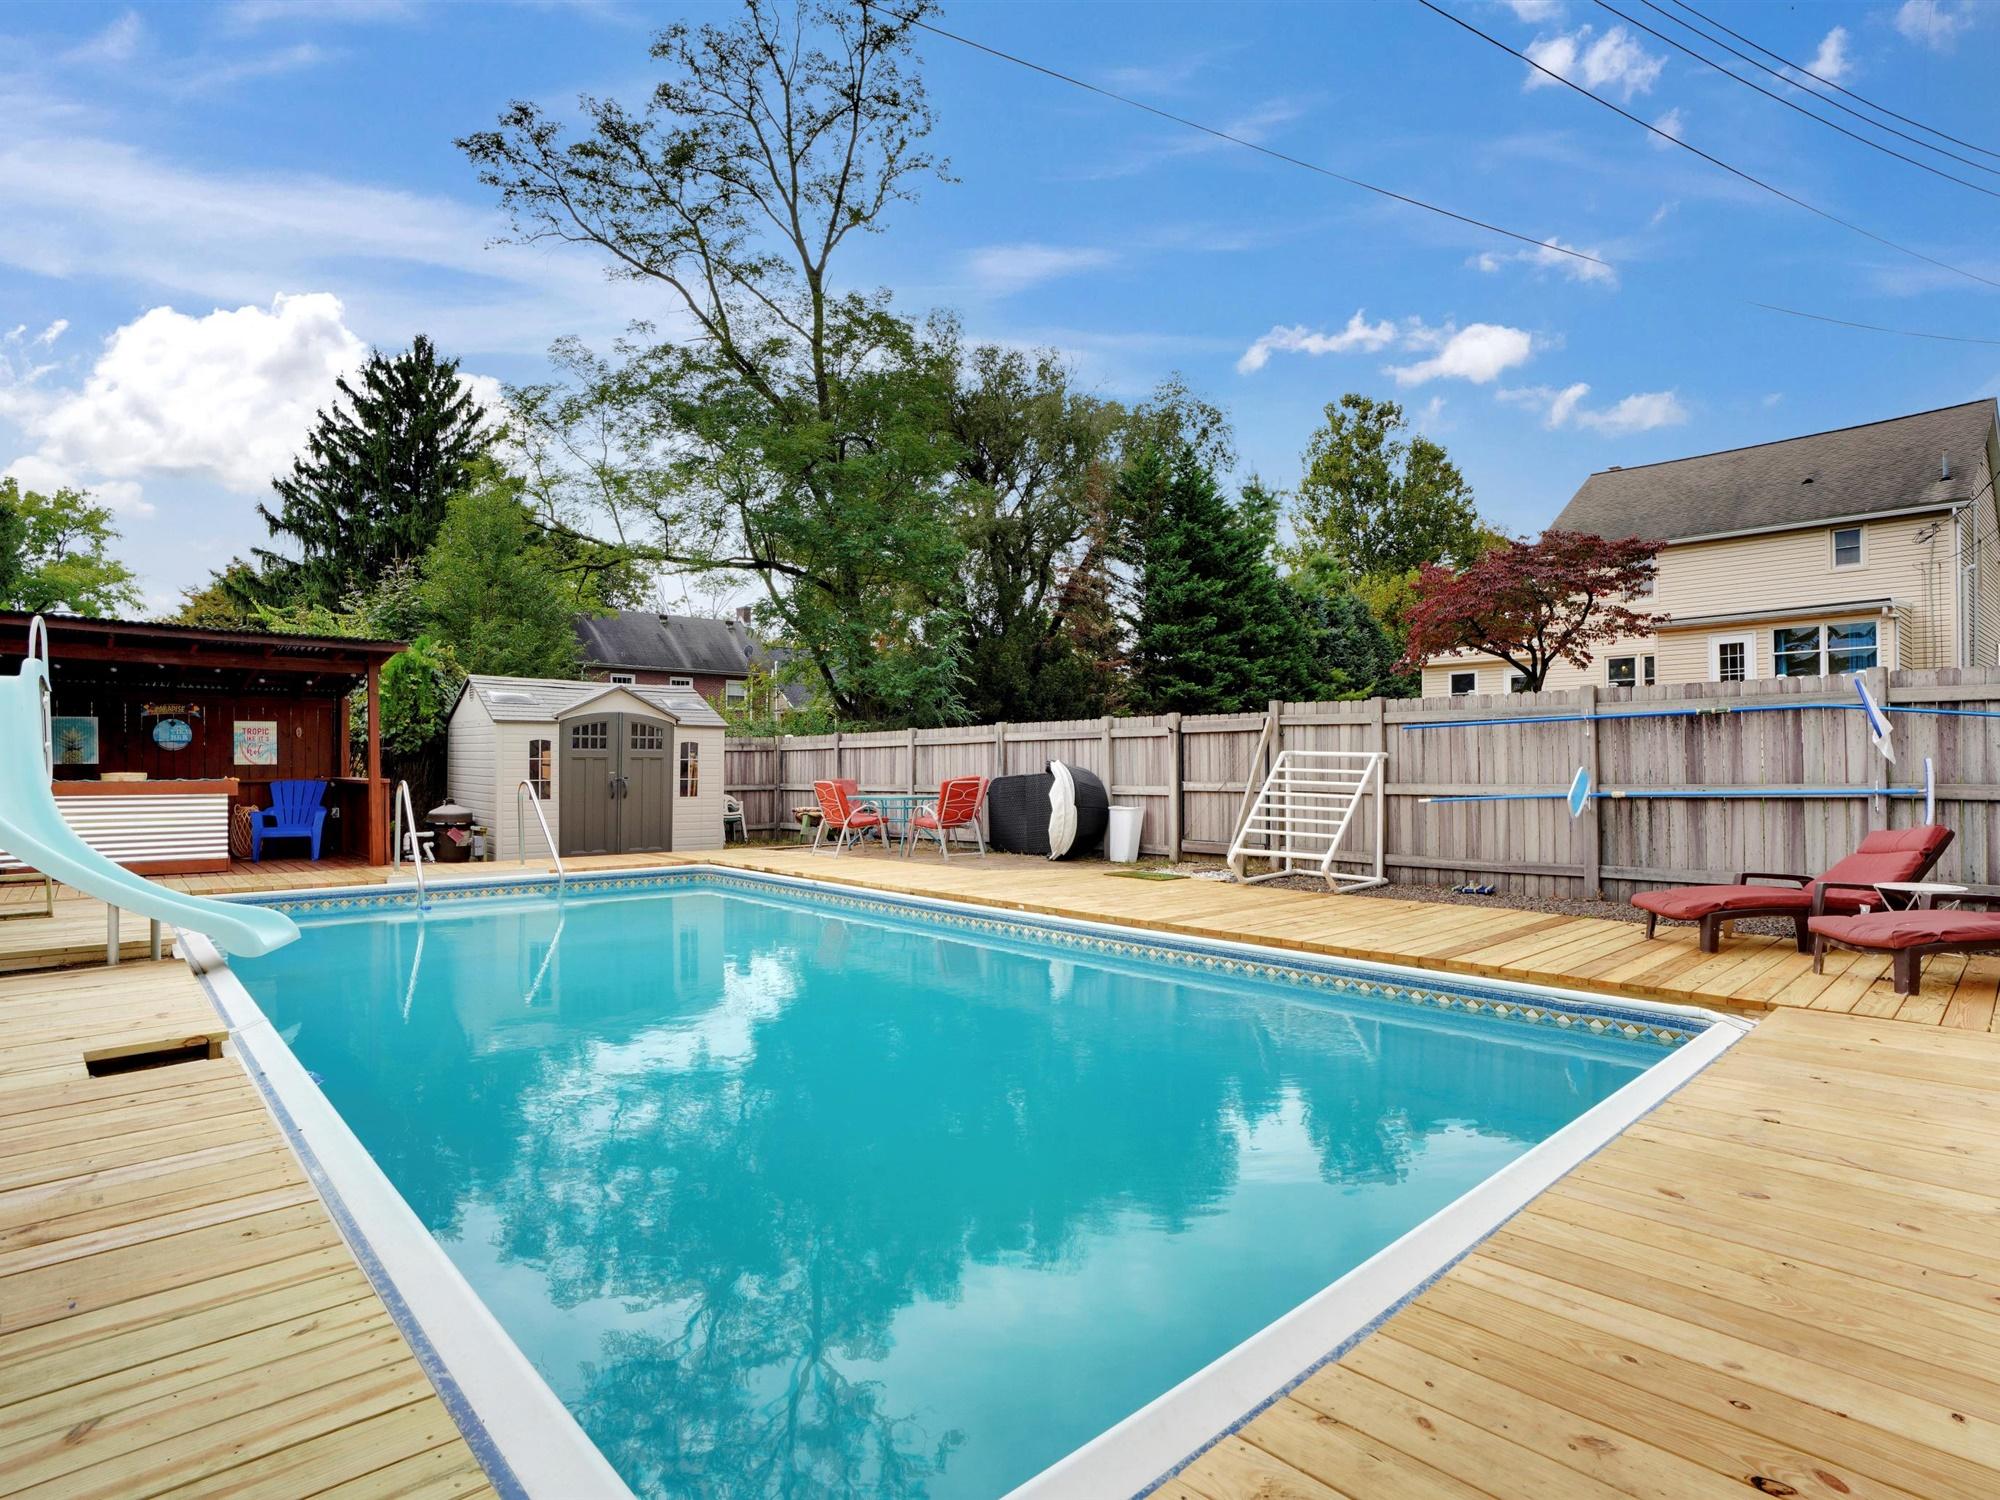 2022 Kline St - fenced in pool